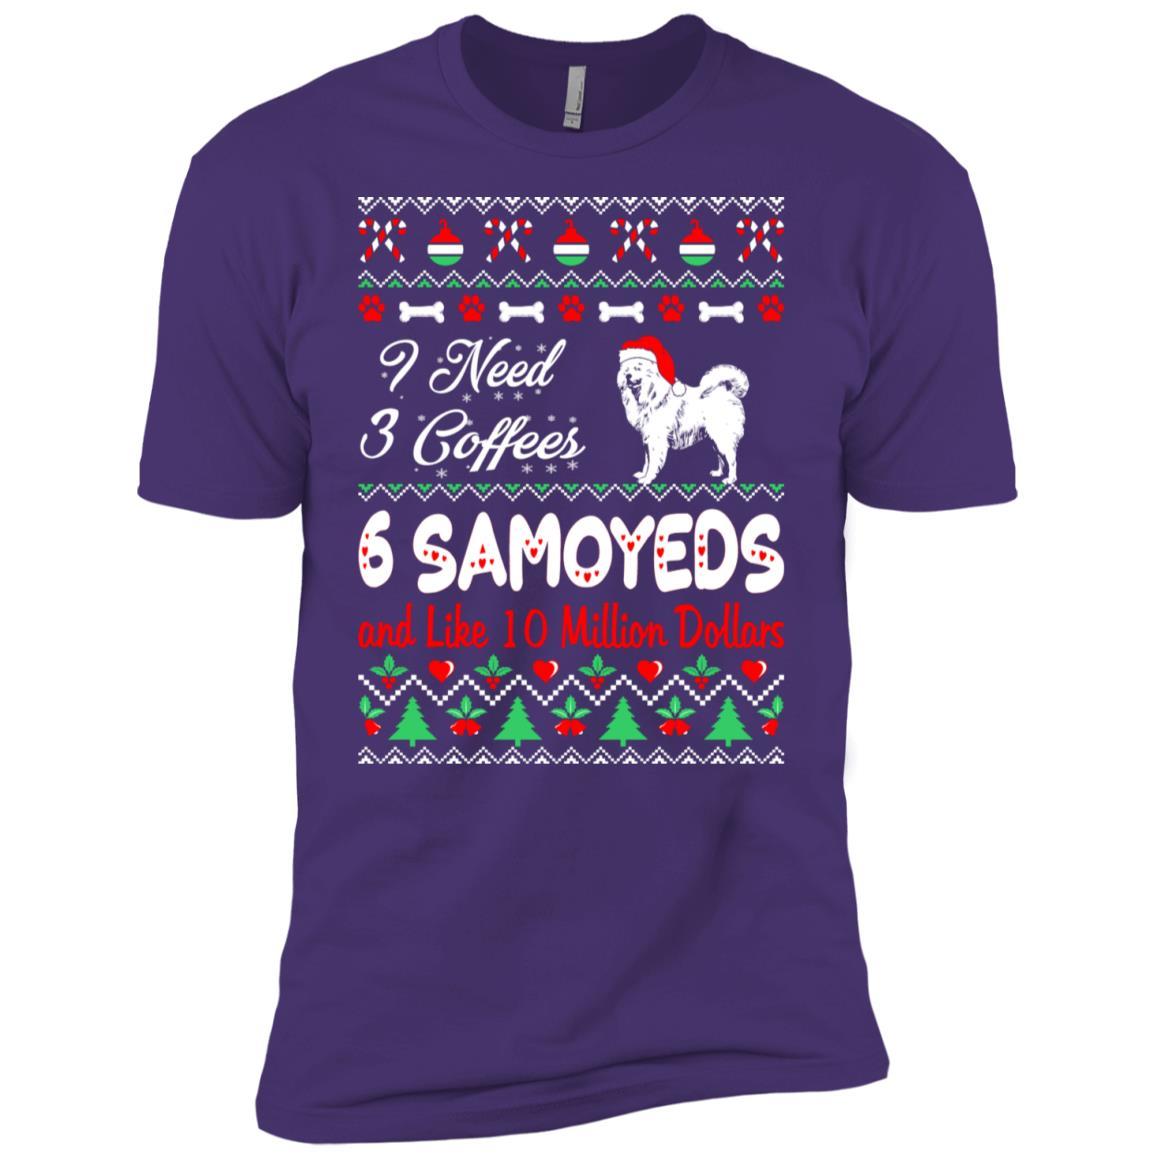 Need 3 Coffees 6 Samoyeds Christmas Ugly Sweater Men Short Sleeve T-Shirt